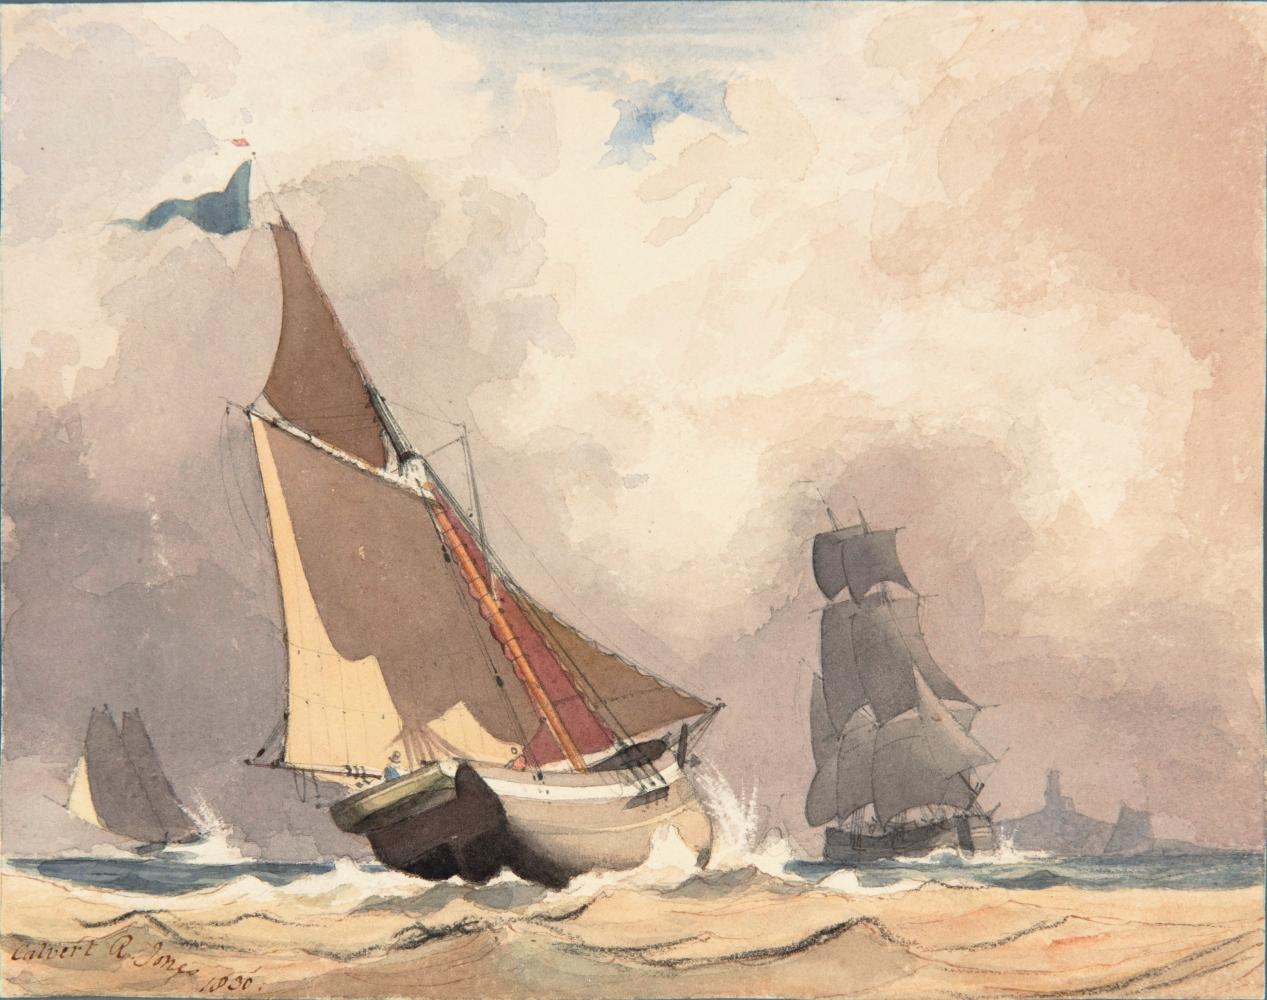 "Rev. Calvert Richard JONES (Welsh, 1802-1877) Study of sailing vessels*, 1830 Watercolour 16.3 x 20.4 cm Signed and dated ""Calvert R. Jones 1830"" in brown ink"